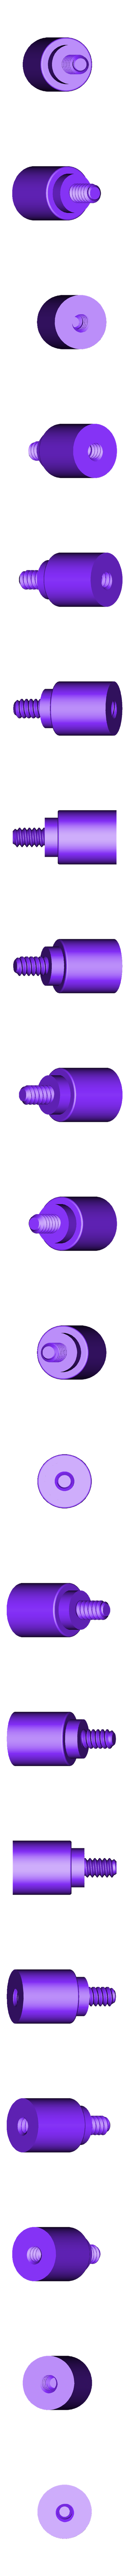 Barrel_-_Part_1.stl Download free STL file 9 gague plasma pistol with barrel tip cover (MPMS mini) • 3D print template, PM_ME_YOUR_VALUE